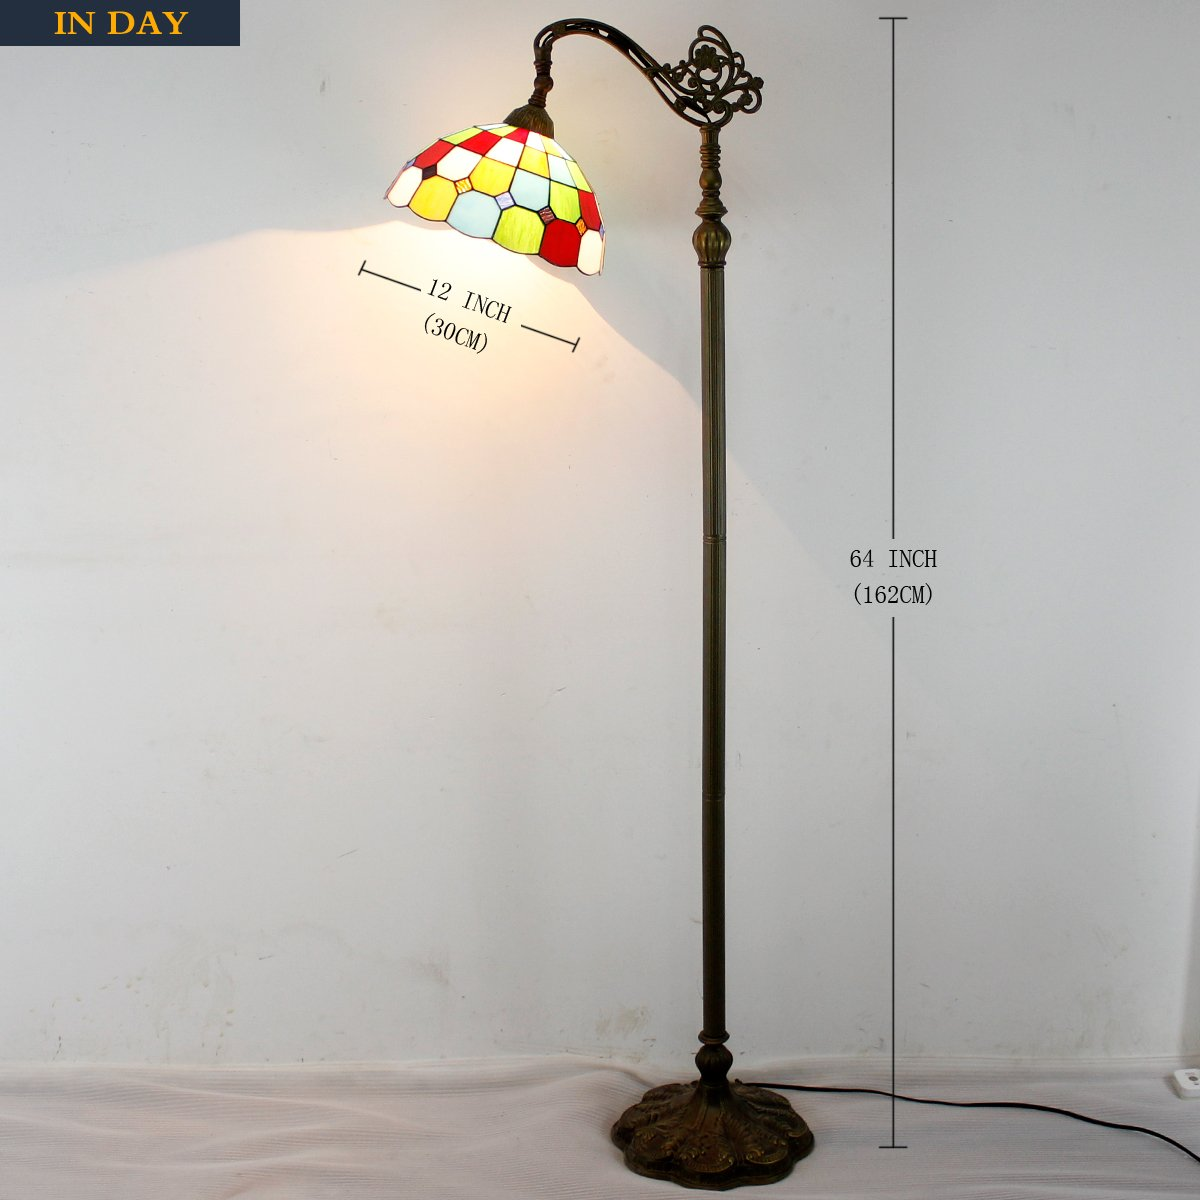 Tiffany Style Reading Floor Lamp Table Desk Lighting Tartan Design W12H64 E26 by werfactory (Image #4)